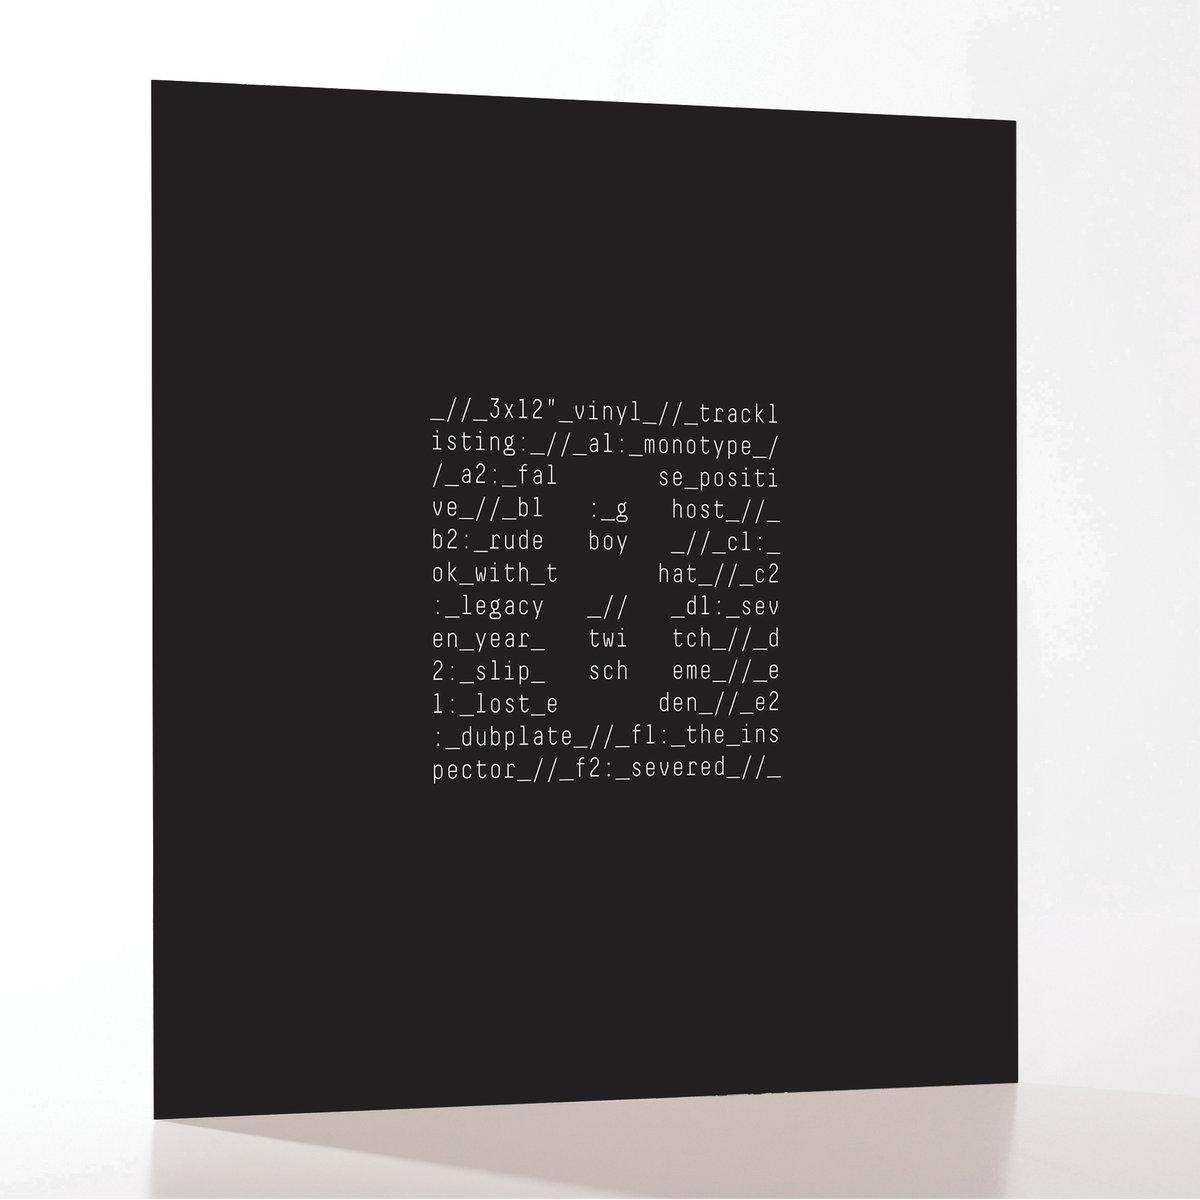 Module Eight - Legacy LP1